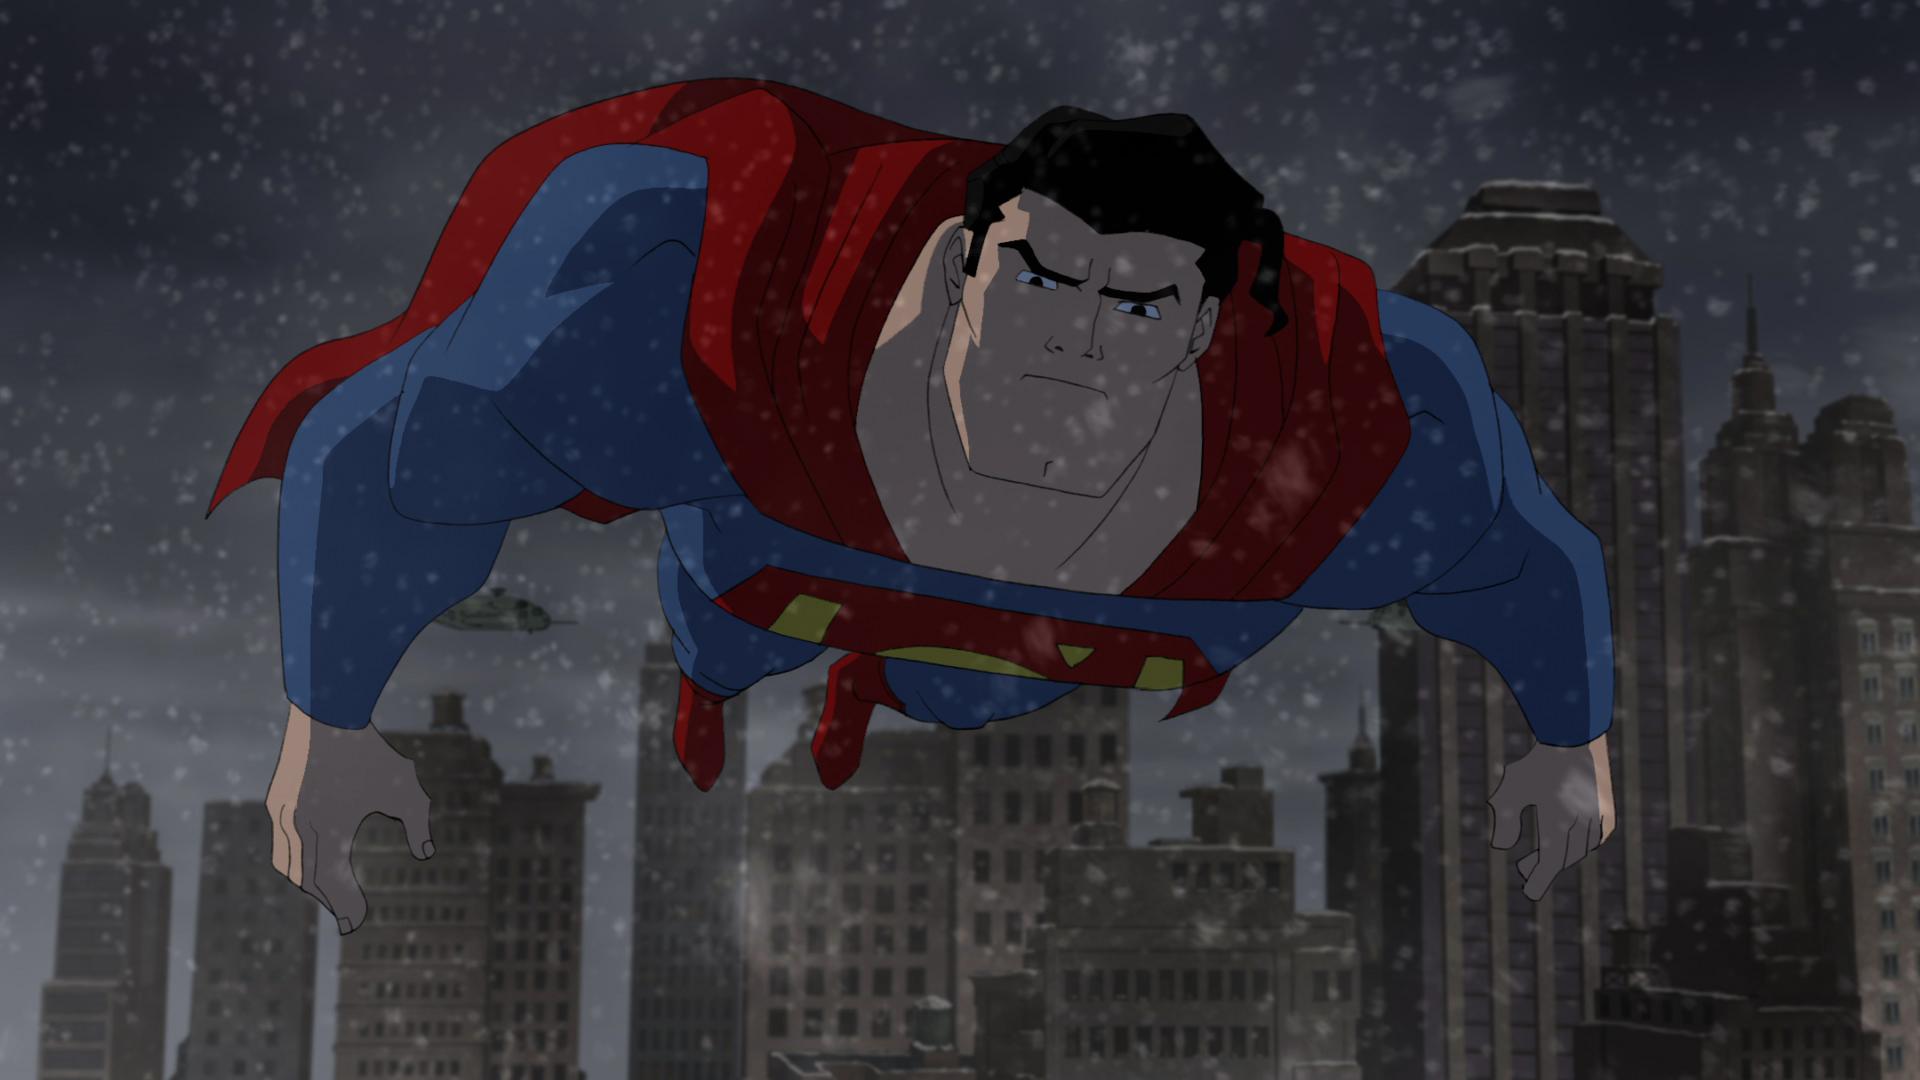 Batman vs superman nice ass - 2 4